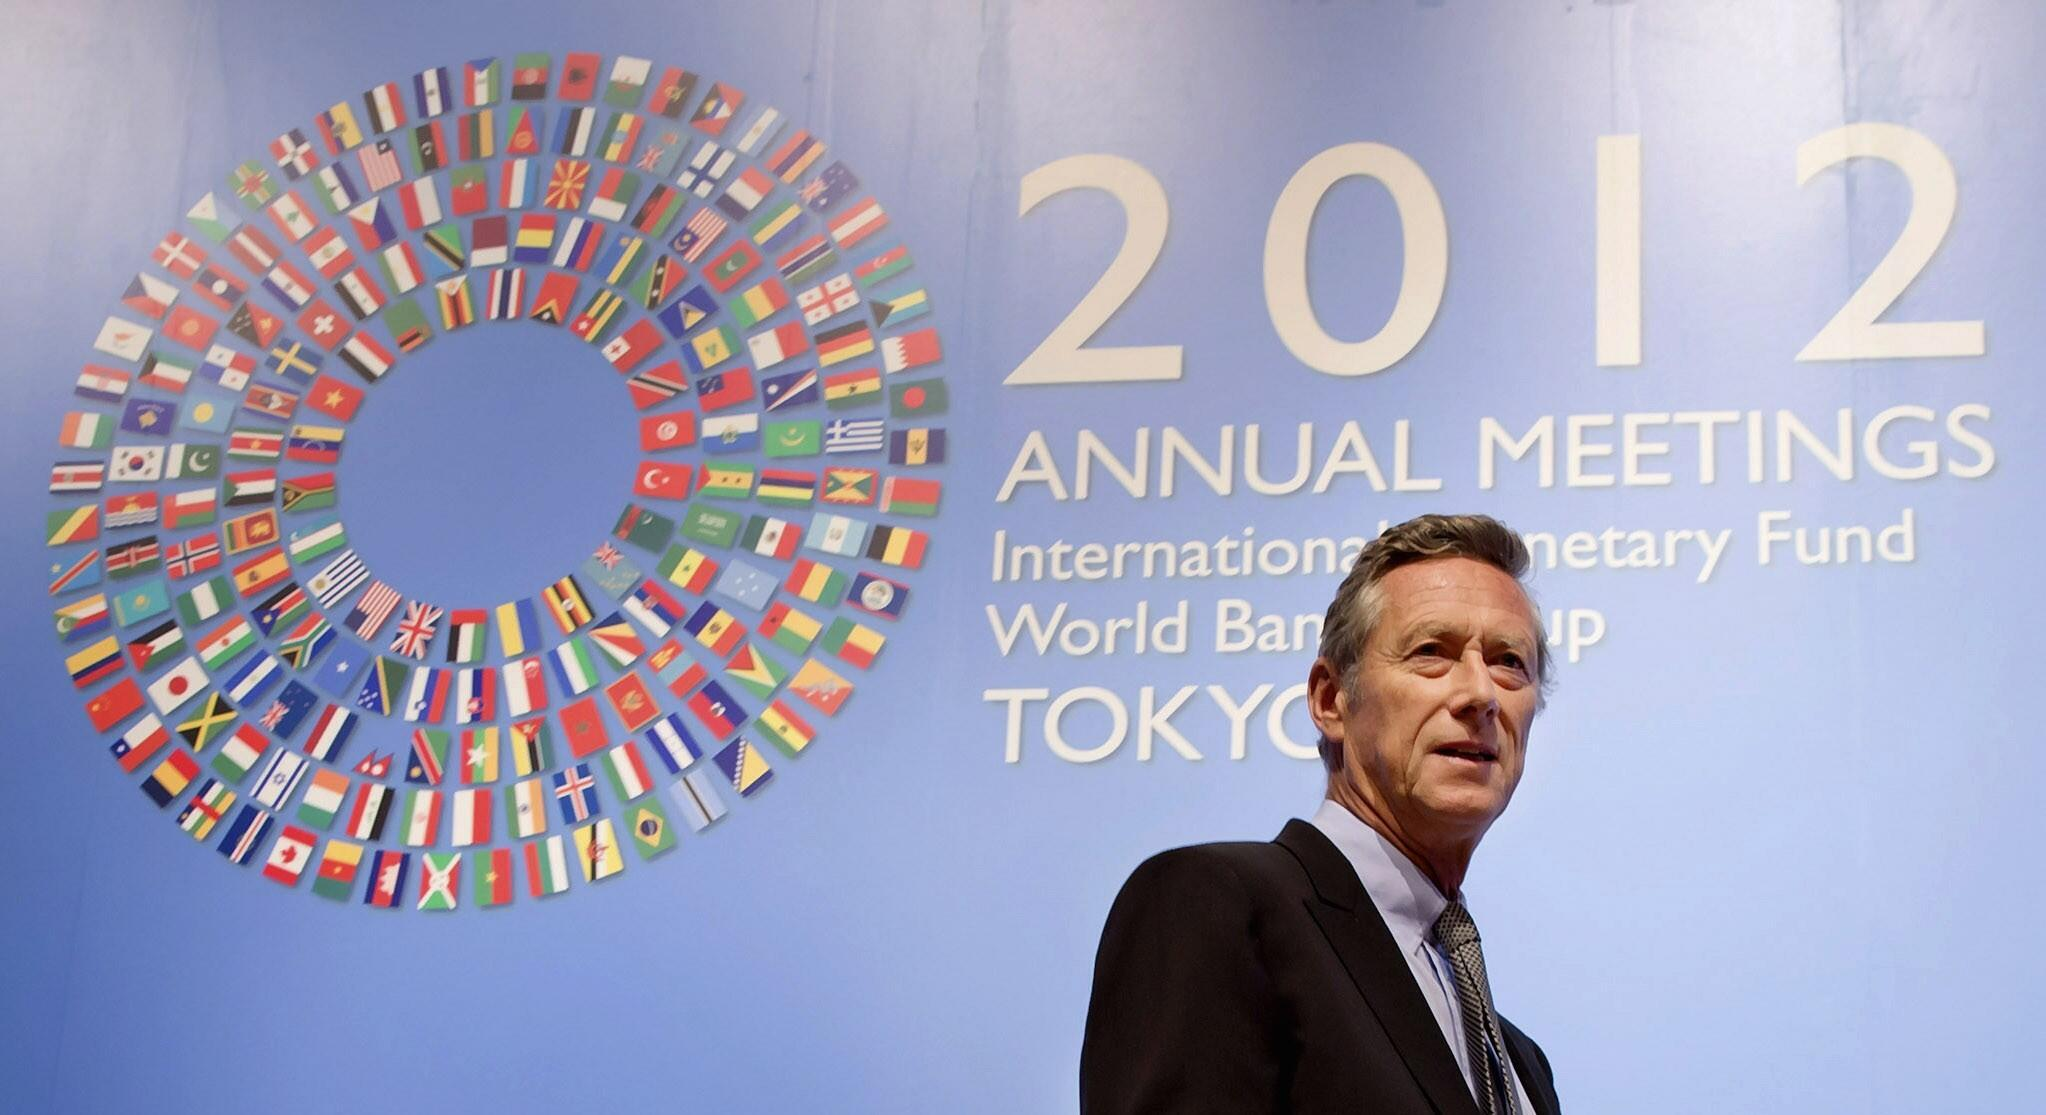 International Monetary Fund's chief economist Olivier Blanchard in 2012